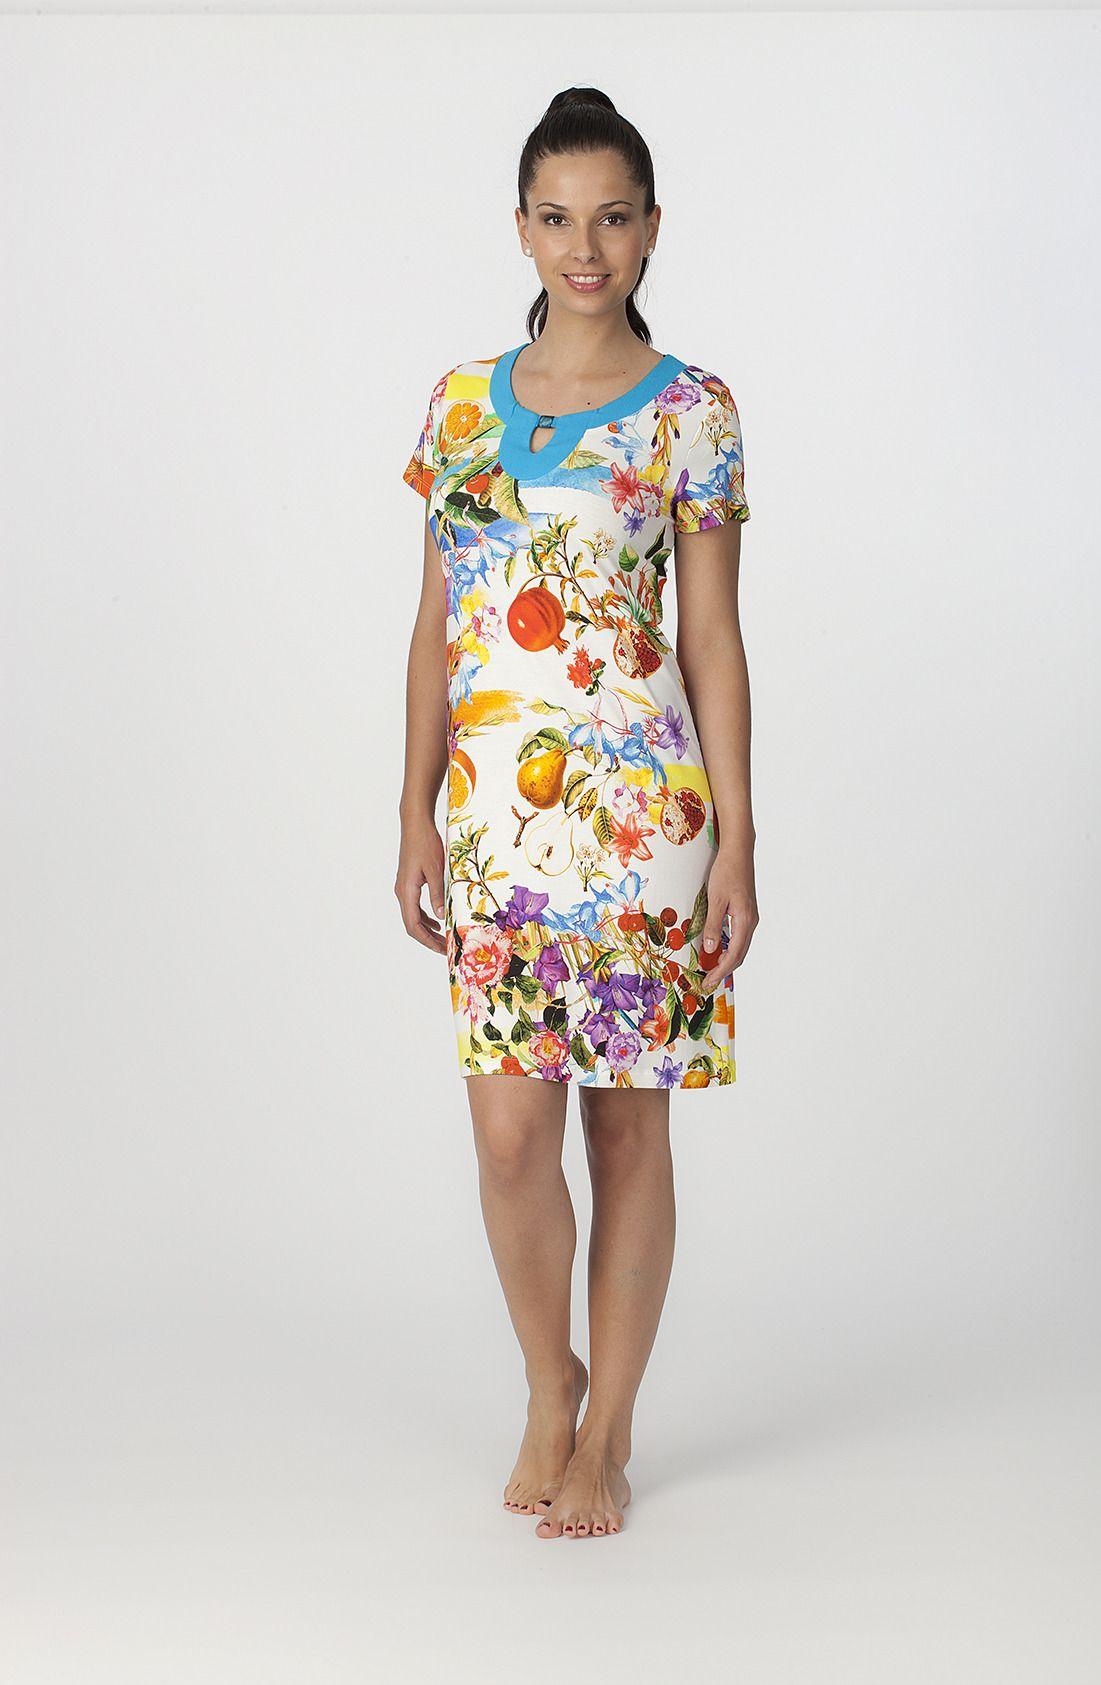 Vestido manga corta modelo Fruit de la firma textil Egatex. http://www.perfumeriaelajuar.com/homewear/vestido-mujer--verano/34/